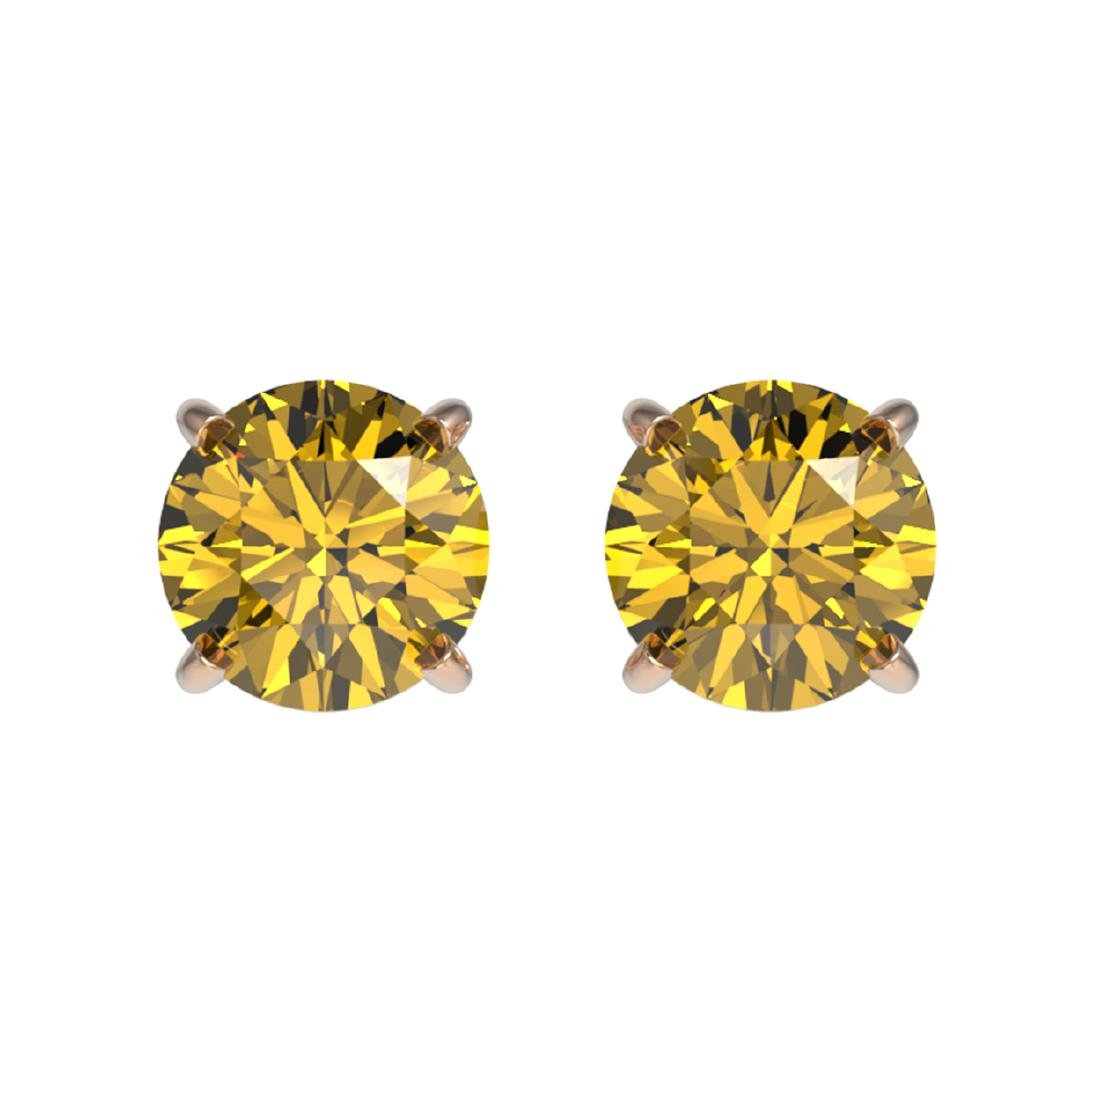 1.08 ctw Intense Yellow Diamond Stud Earrings 10K Rose